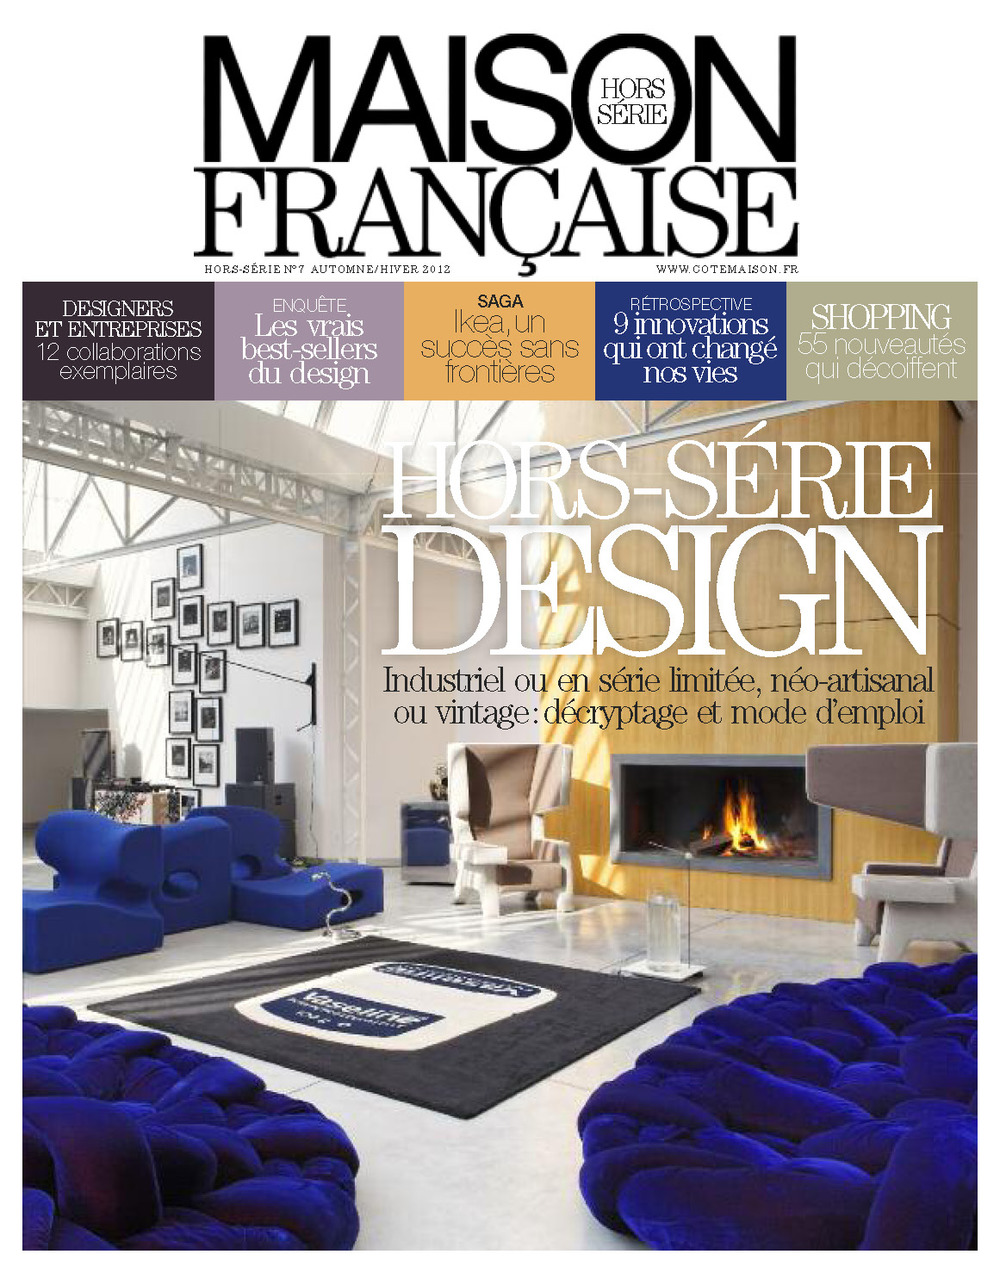 Maison franaise magazine maison franaise magazine p2 for Maison francaise magazine abonnement